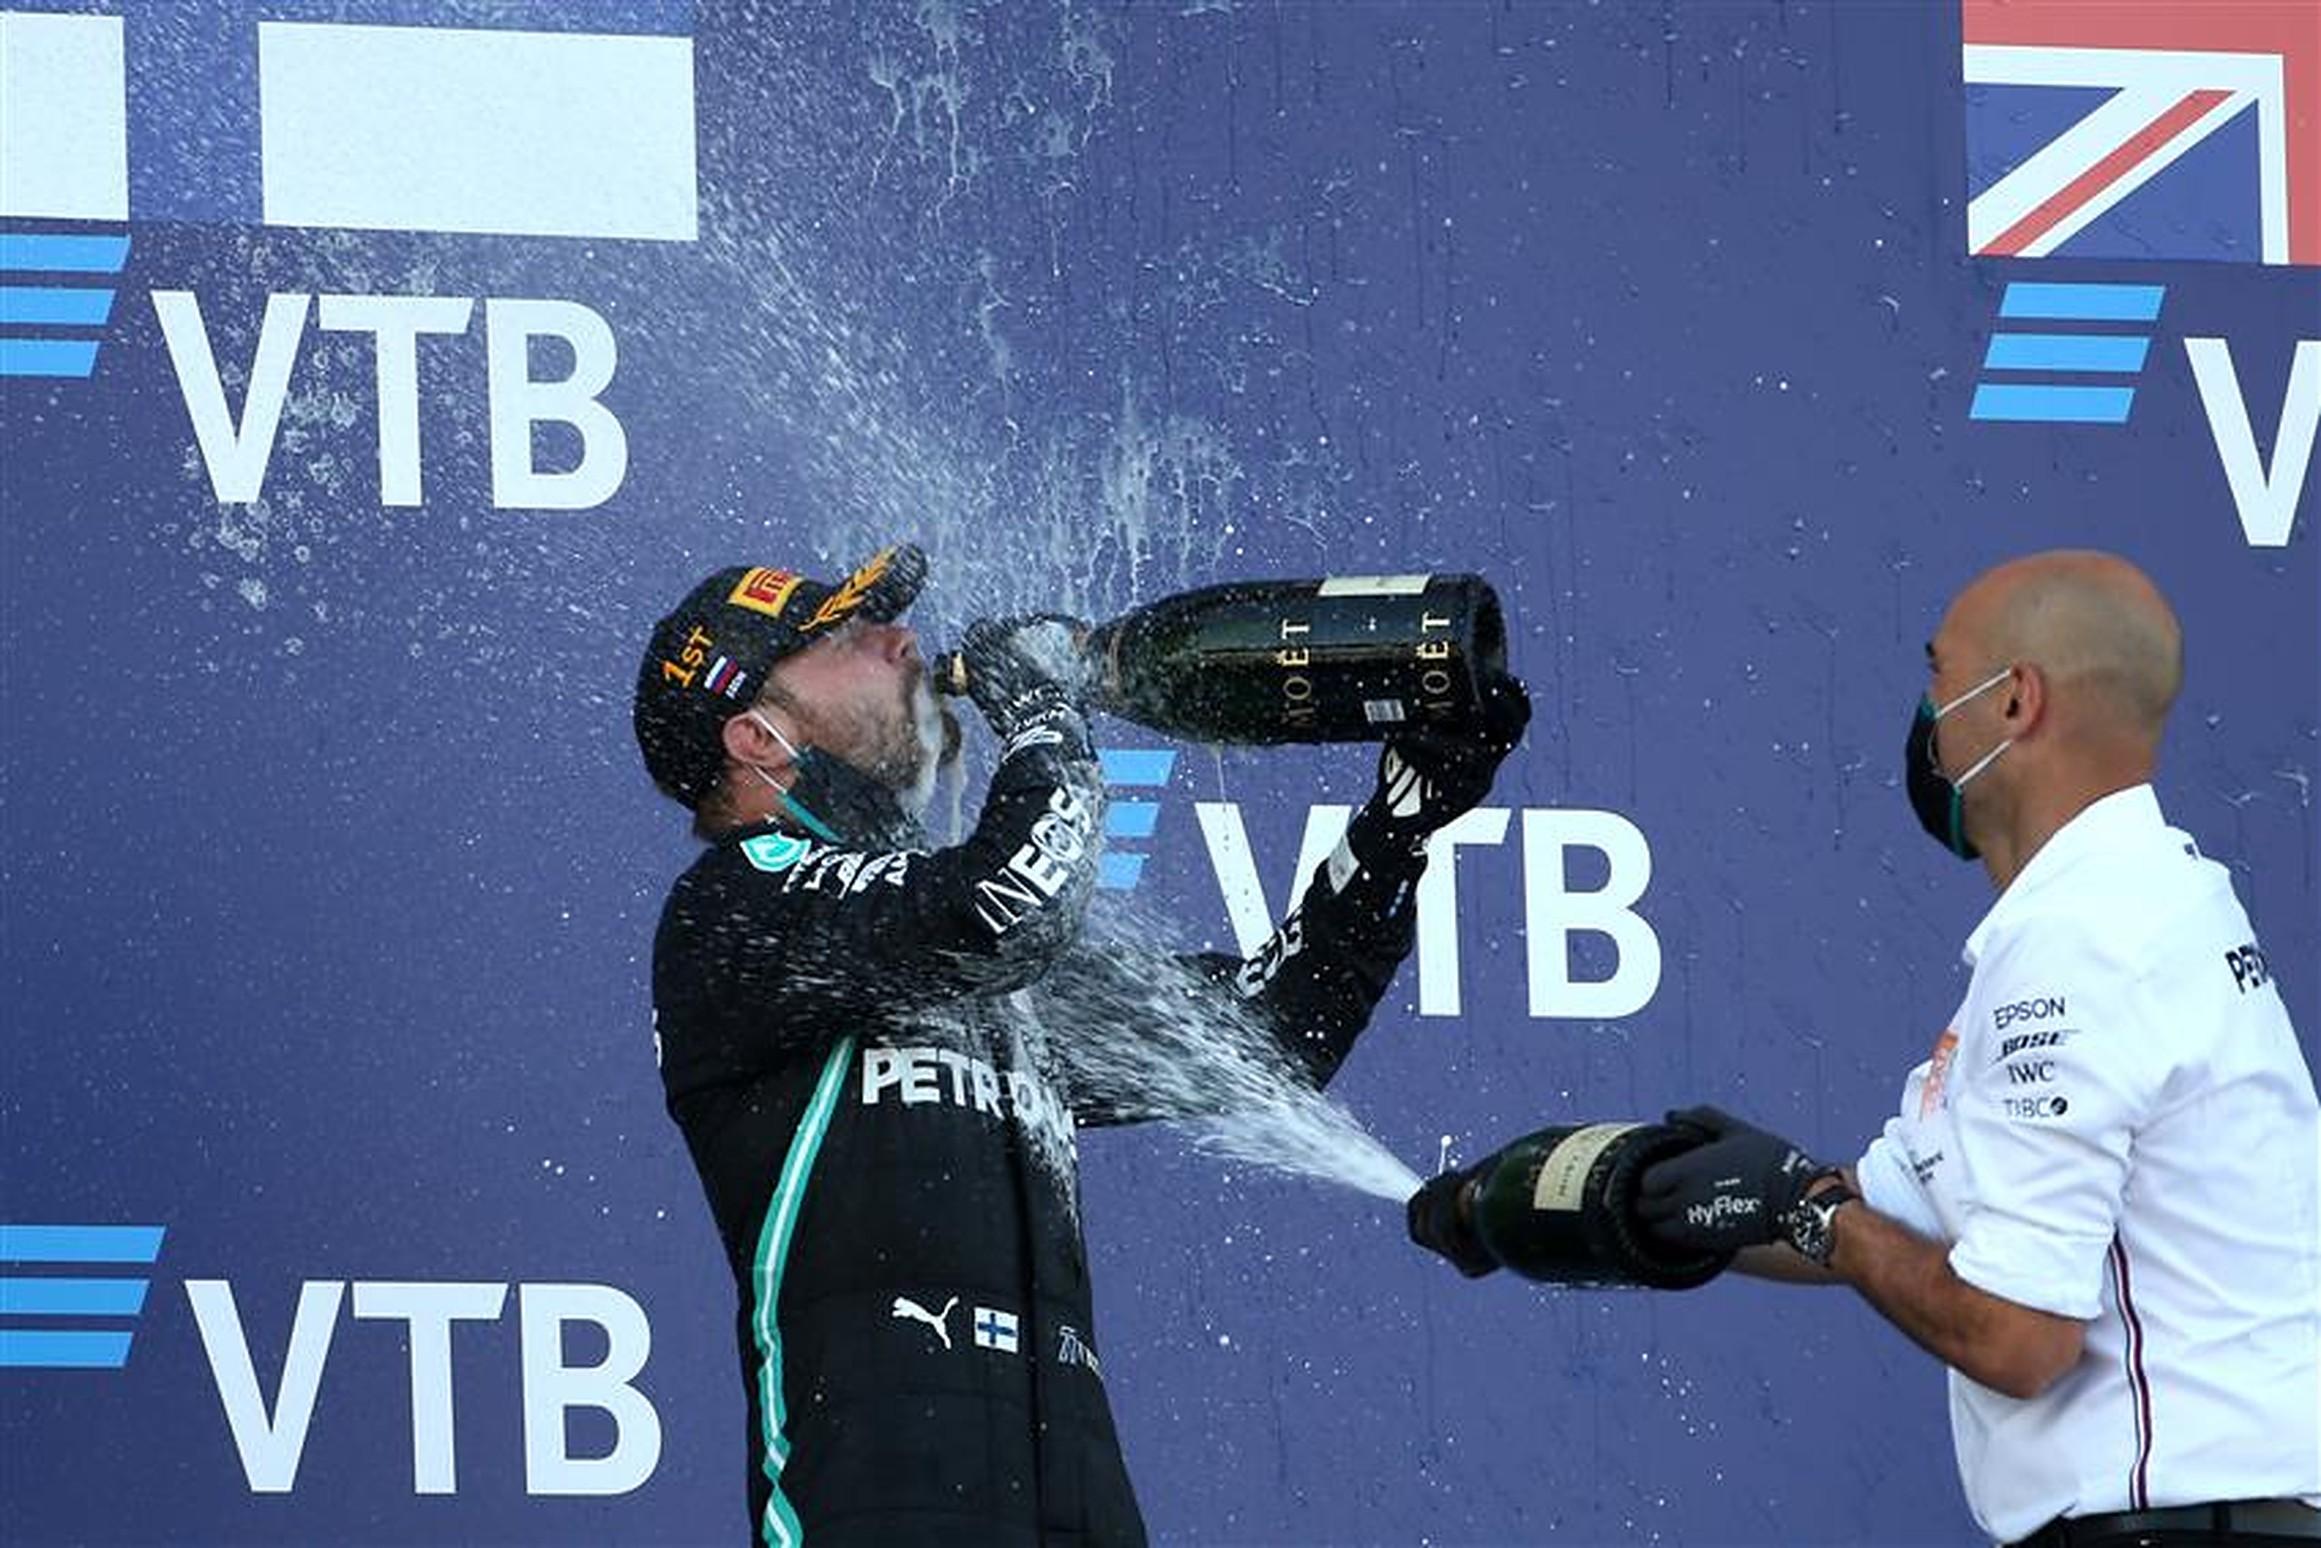 Dominique Riefstahl and Valtteri Bottas after winning 2020 Russian GP - Formula1News.co.uk